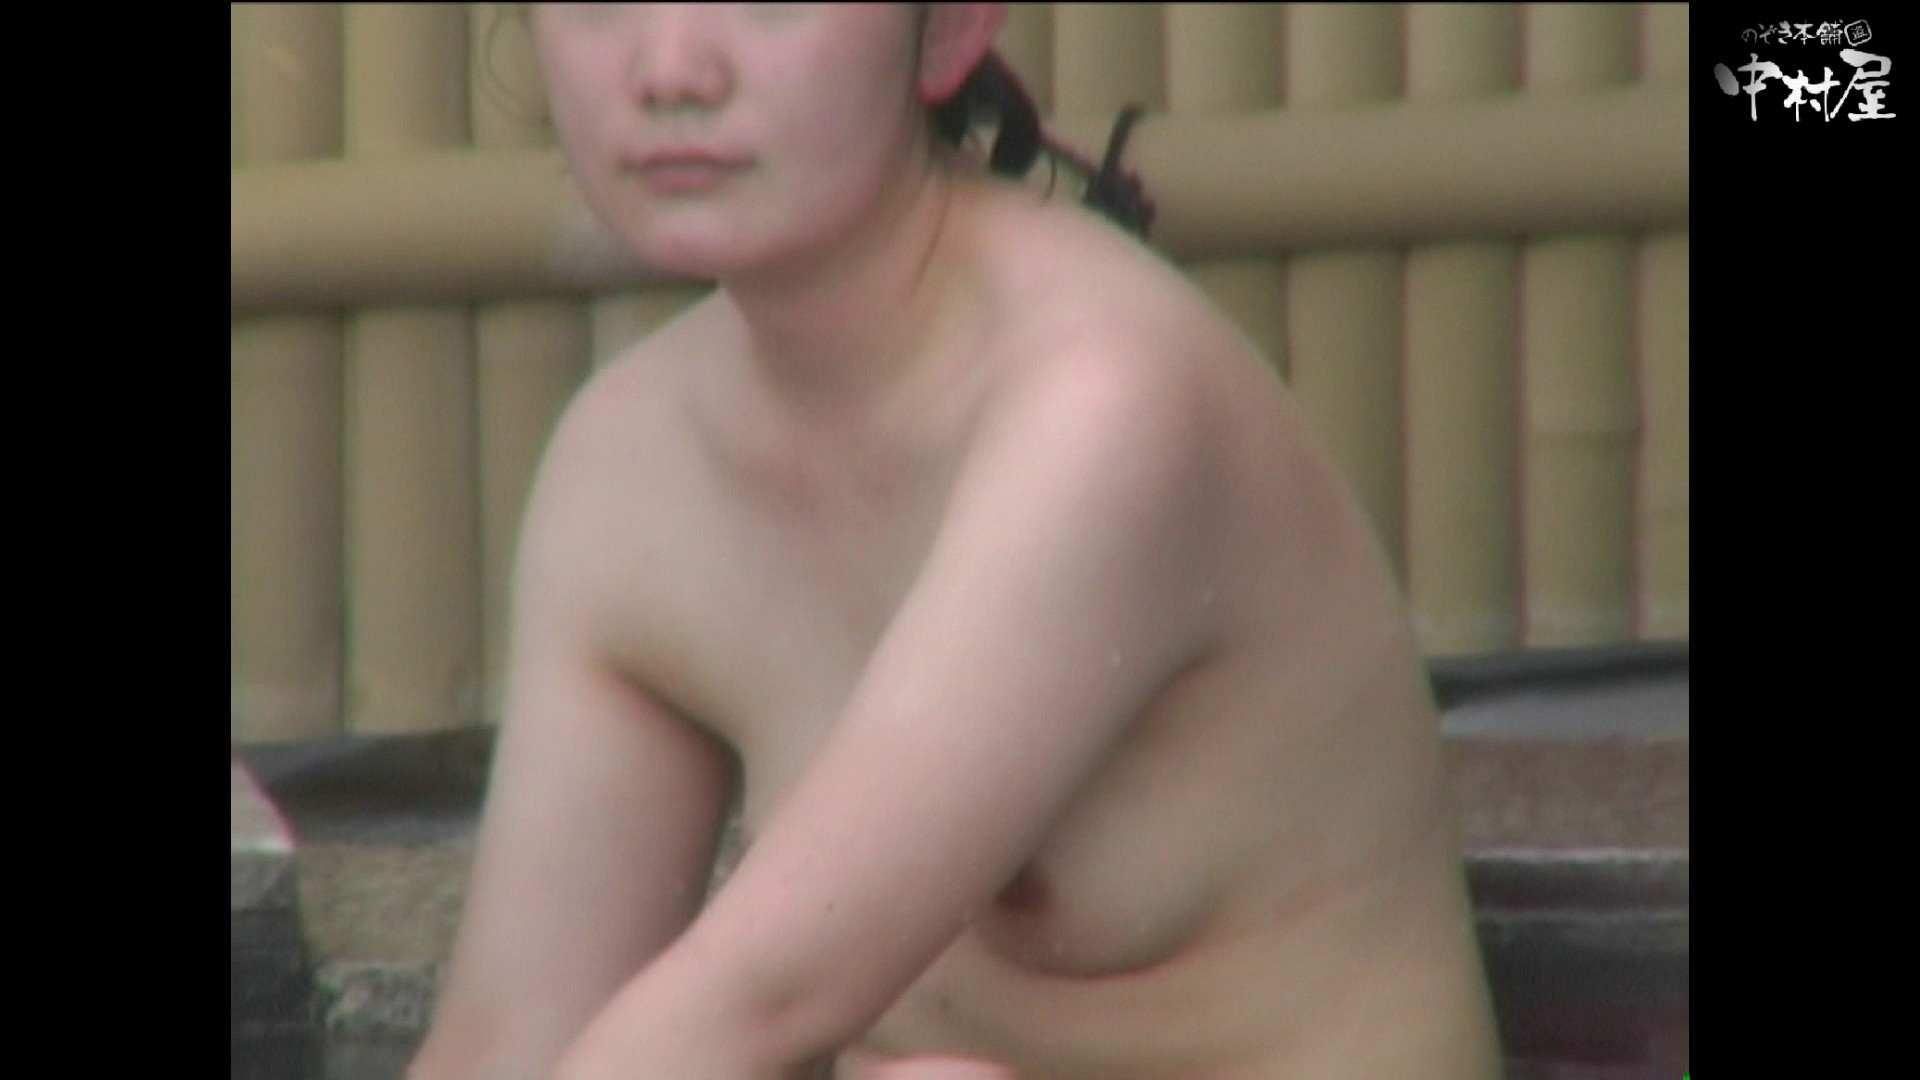 Aquaな露天風呂Vol.892 盗撮 われめAV動画紹介 80画像 35